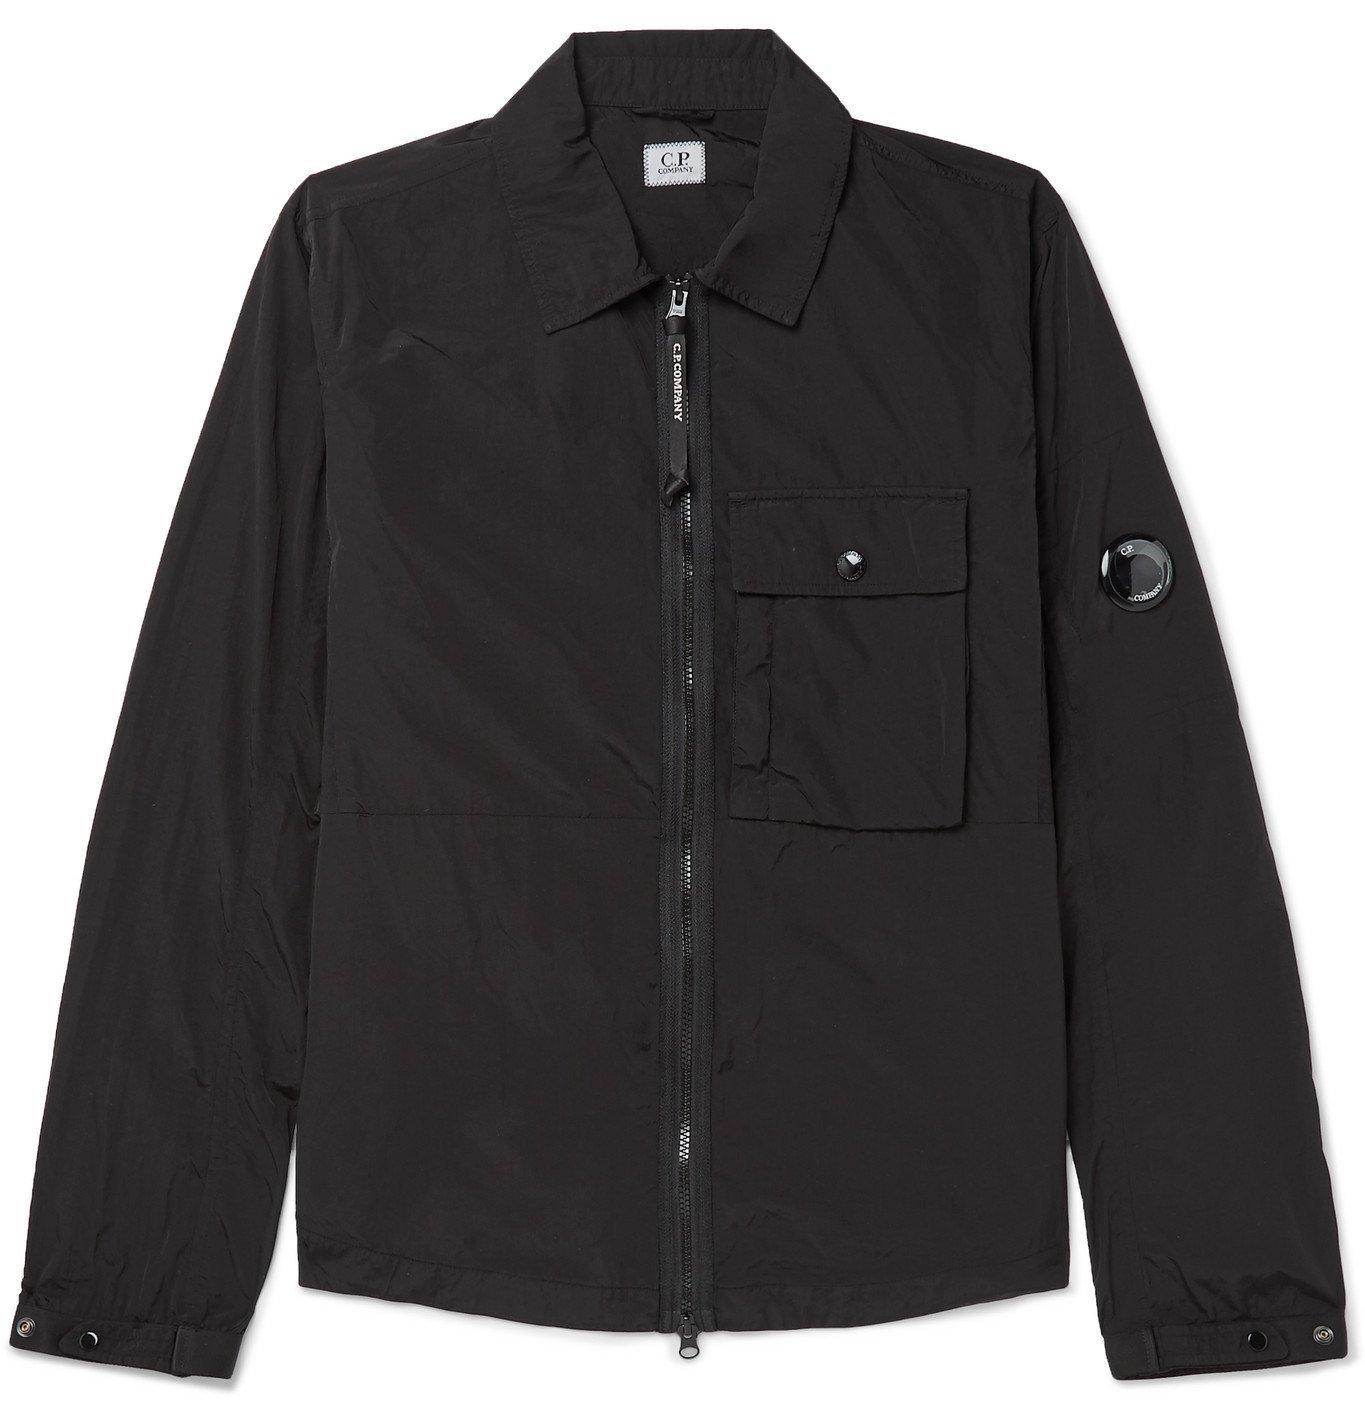 C.P. Company - Garment-Dyed Nylon Overshirt - Black